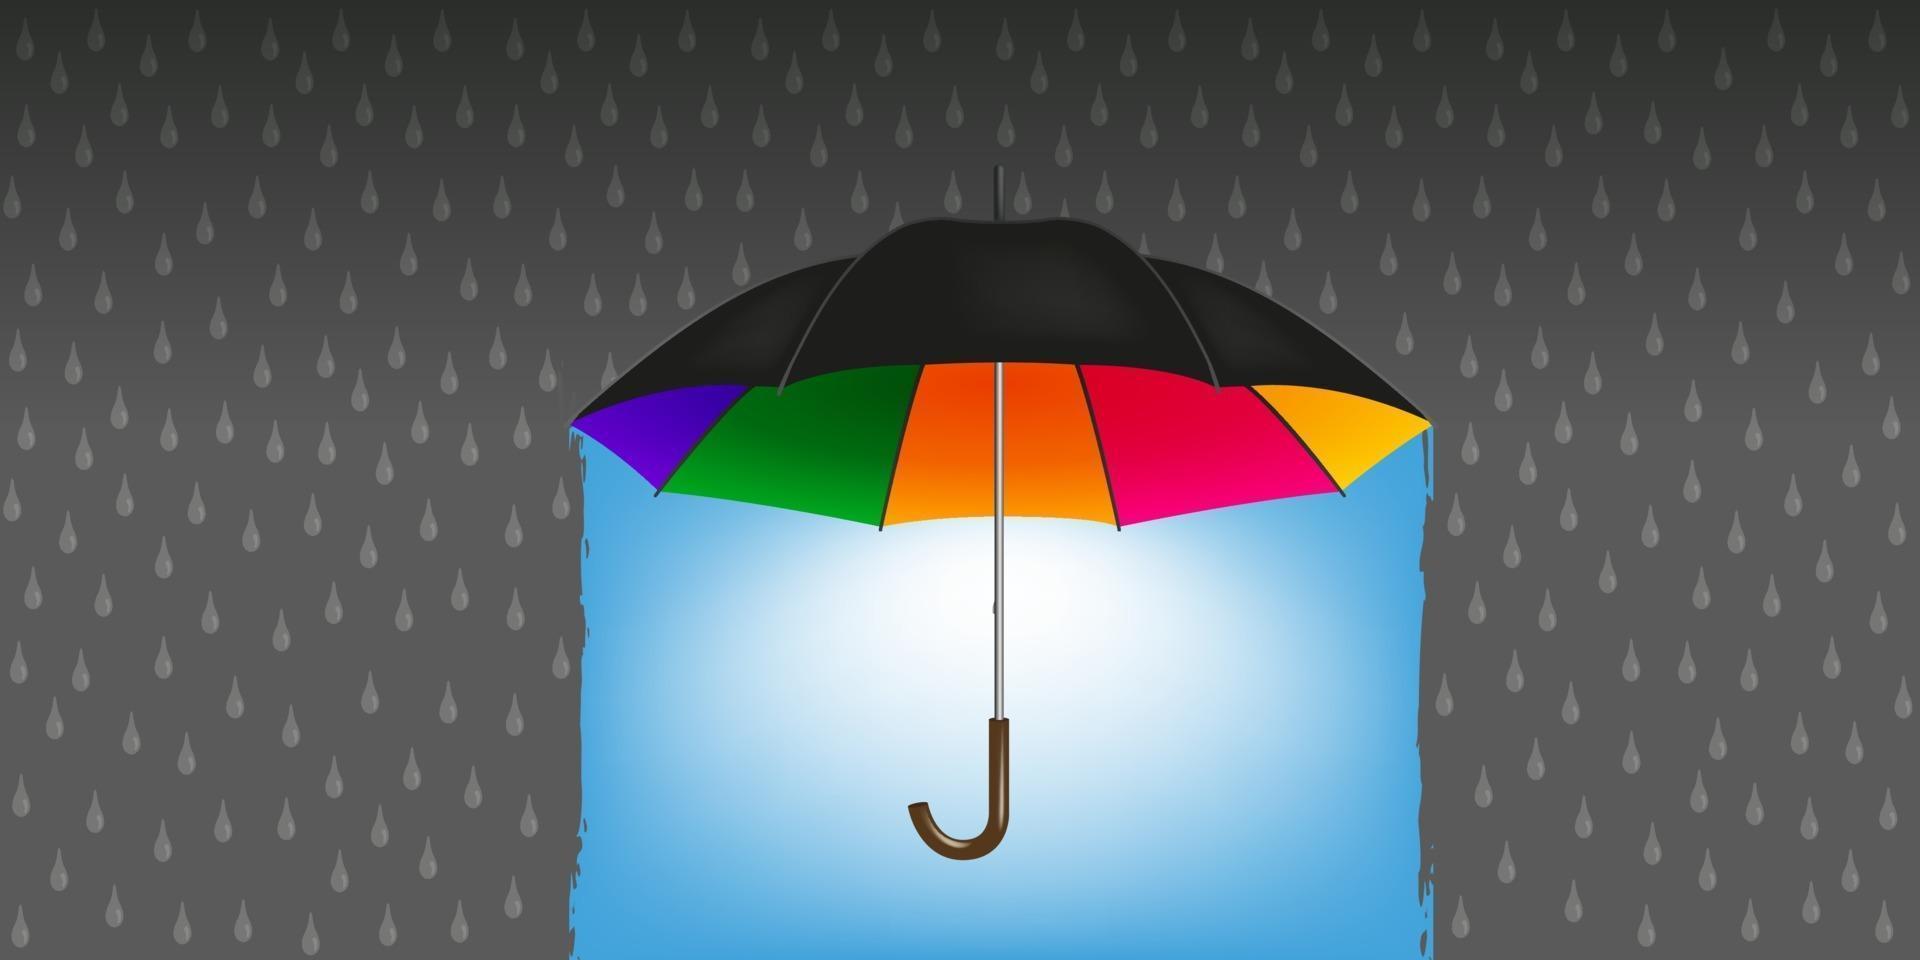 Ein magischer Regenschirm verwandelt Regen in gutes Wetter vektor